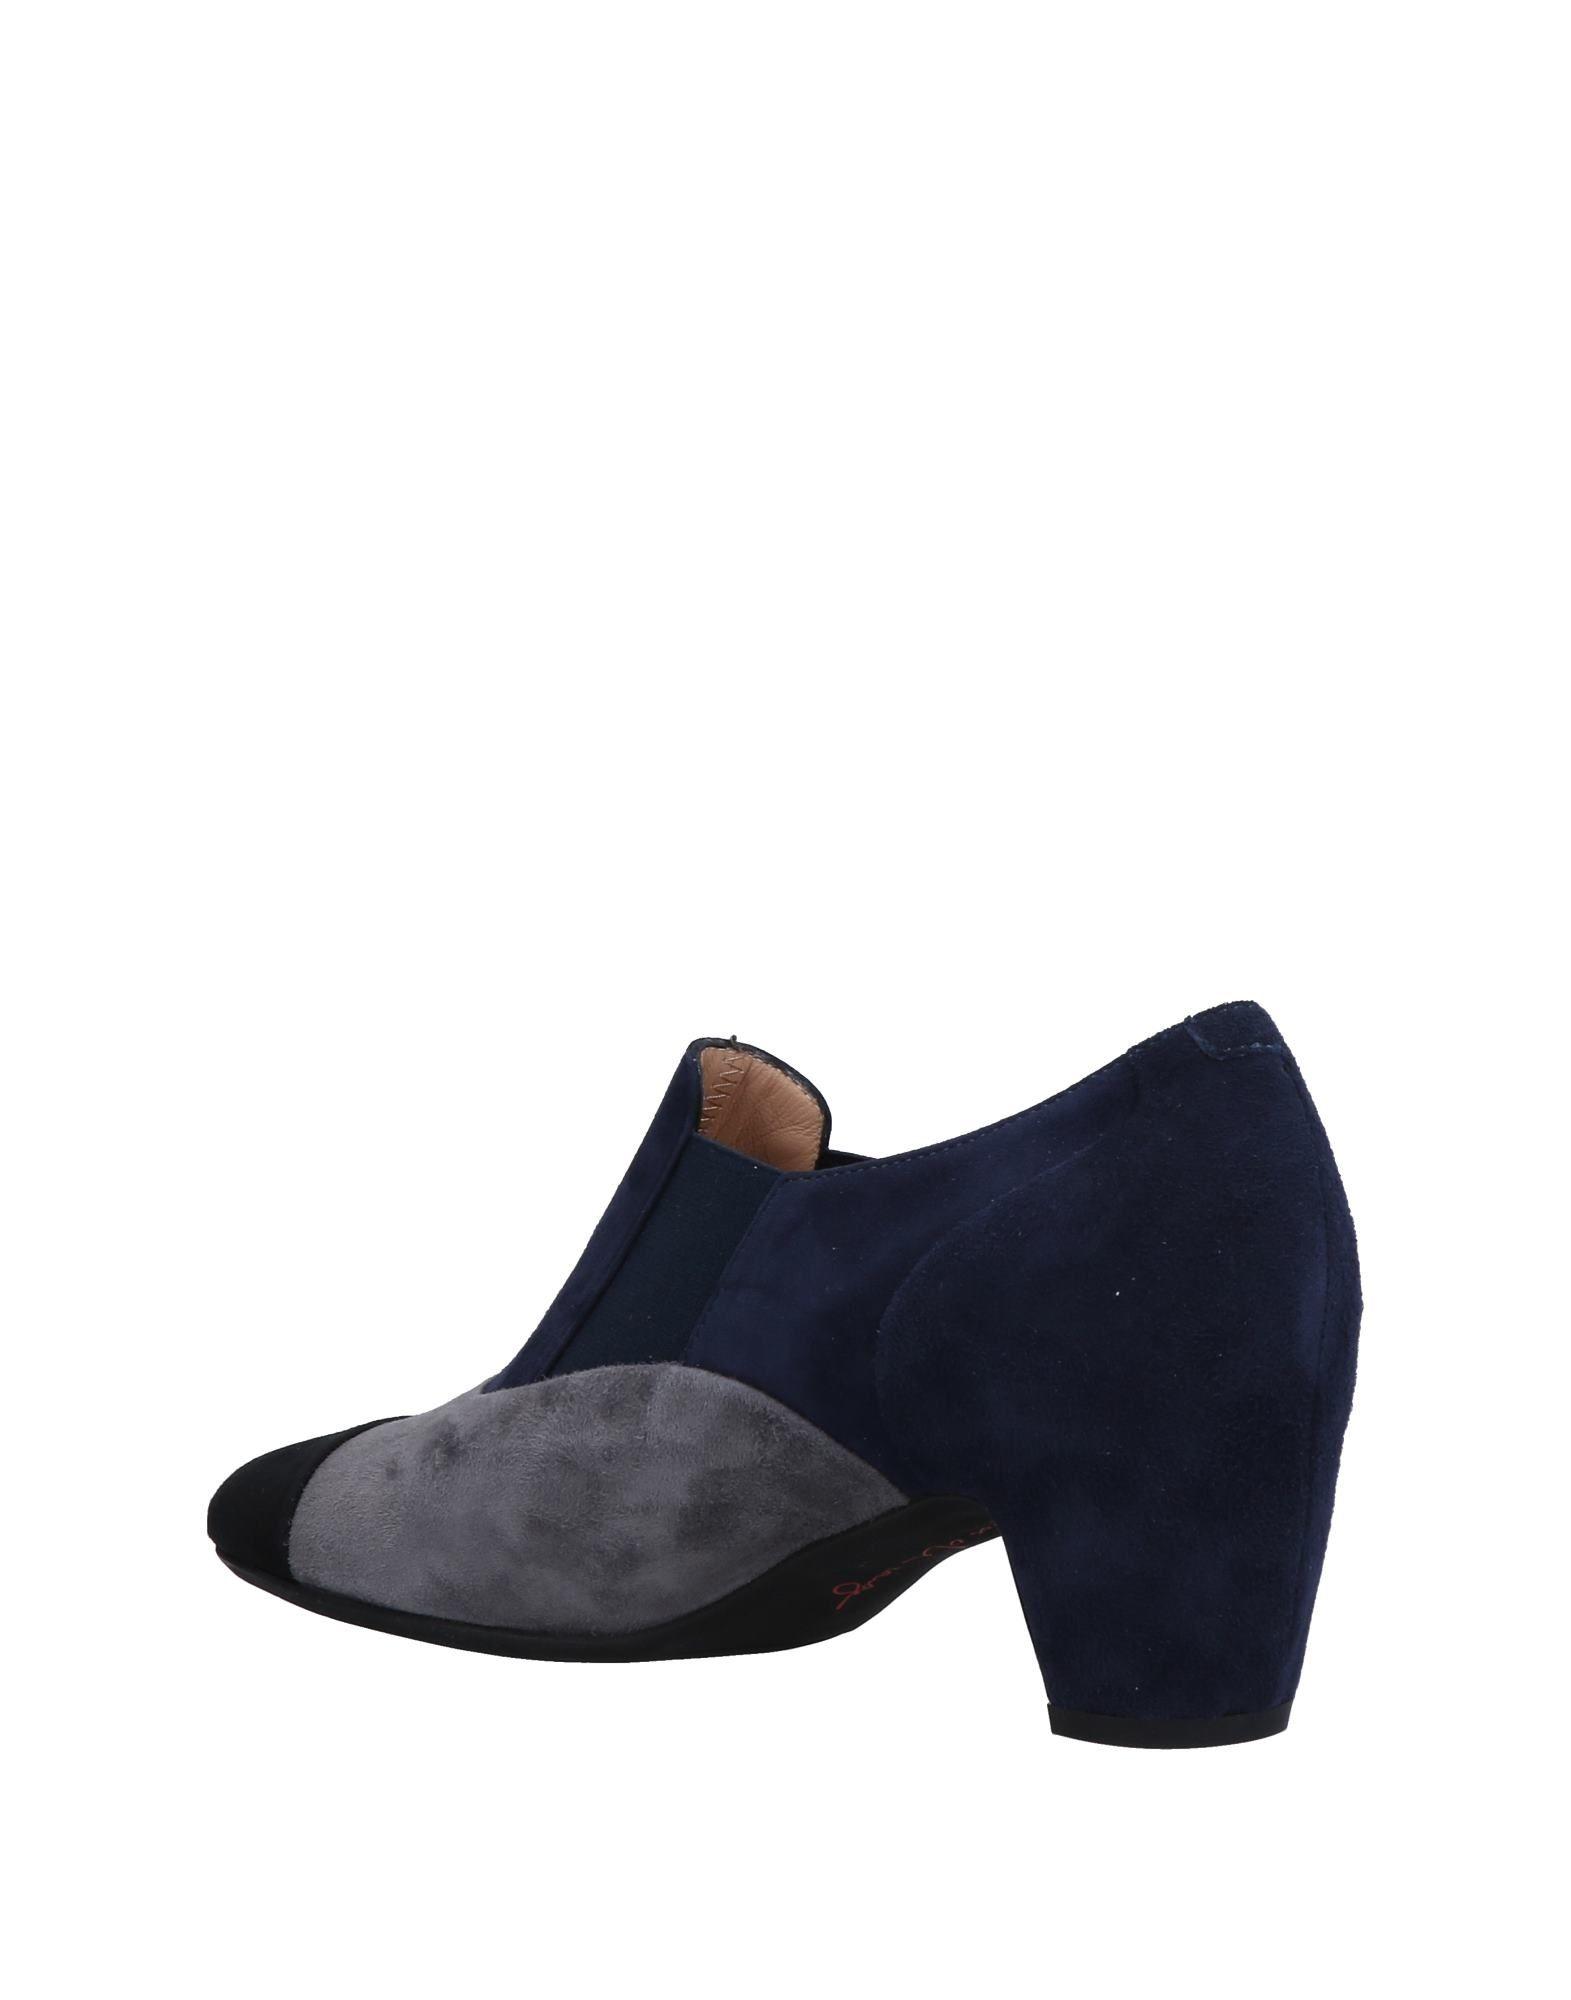 Stilvolle billige Schuhe Damen Pas De Rouge Stiefelette Damen Schuhe  11510943HQ 7337c2